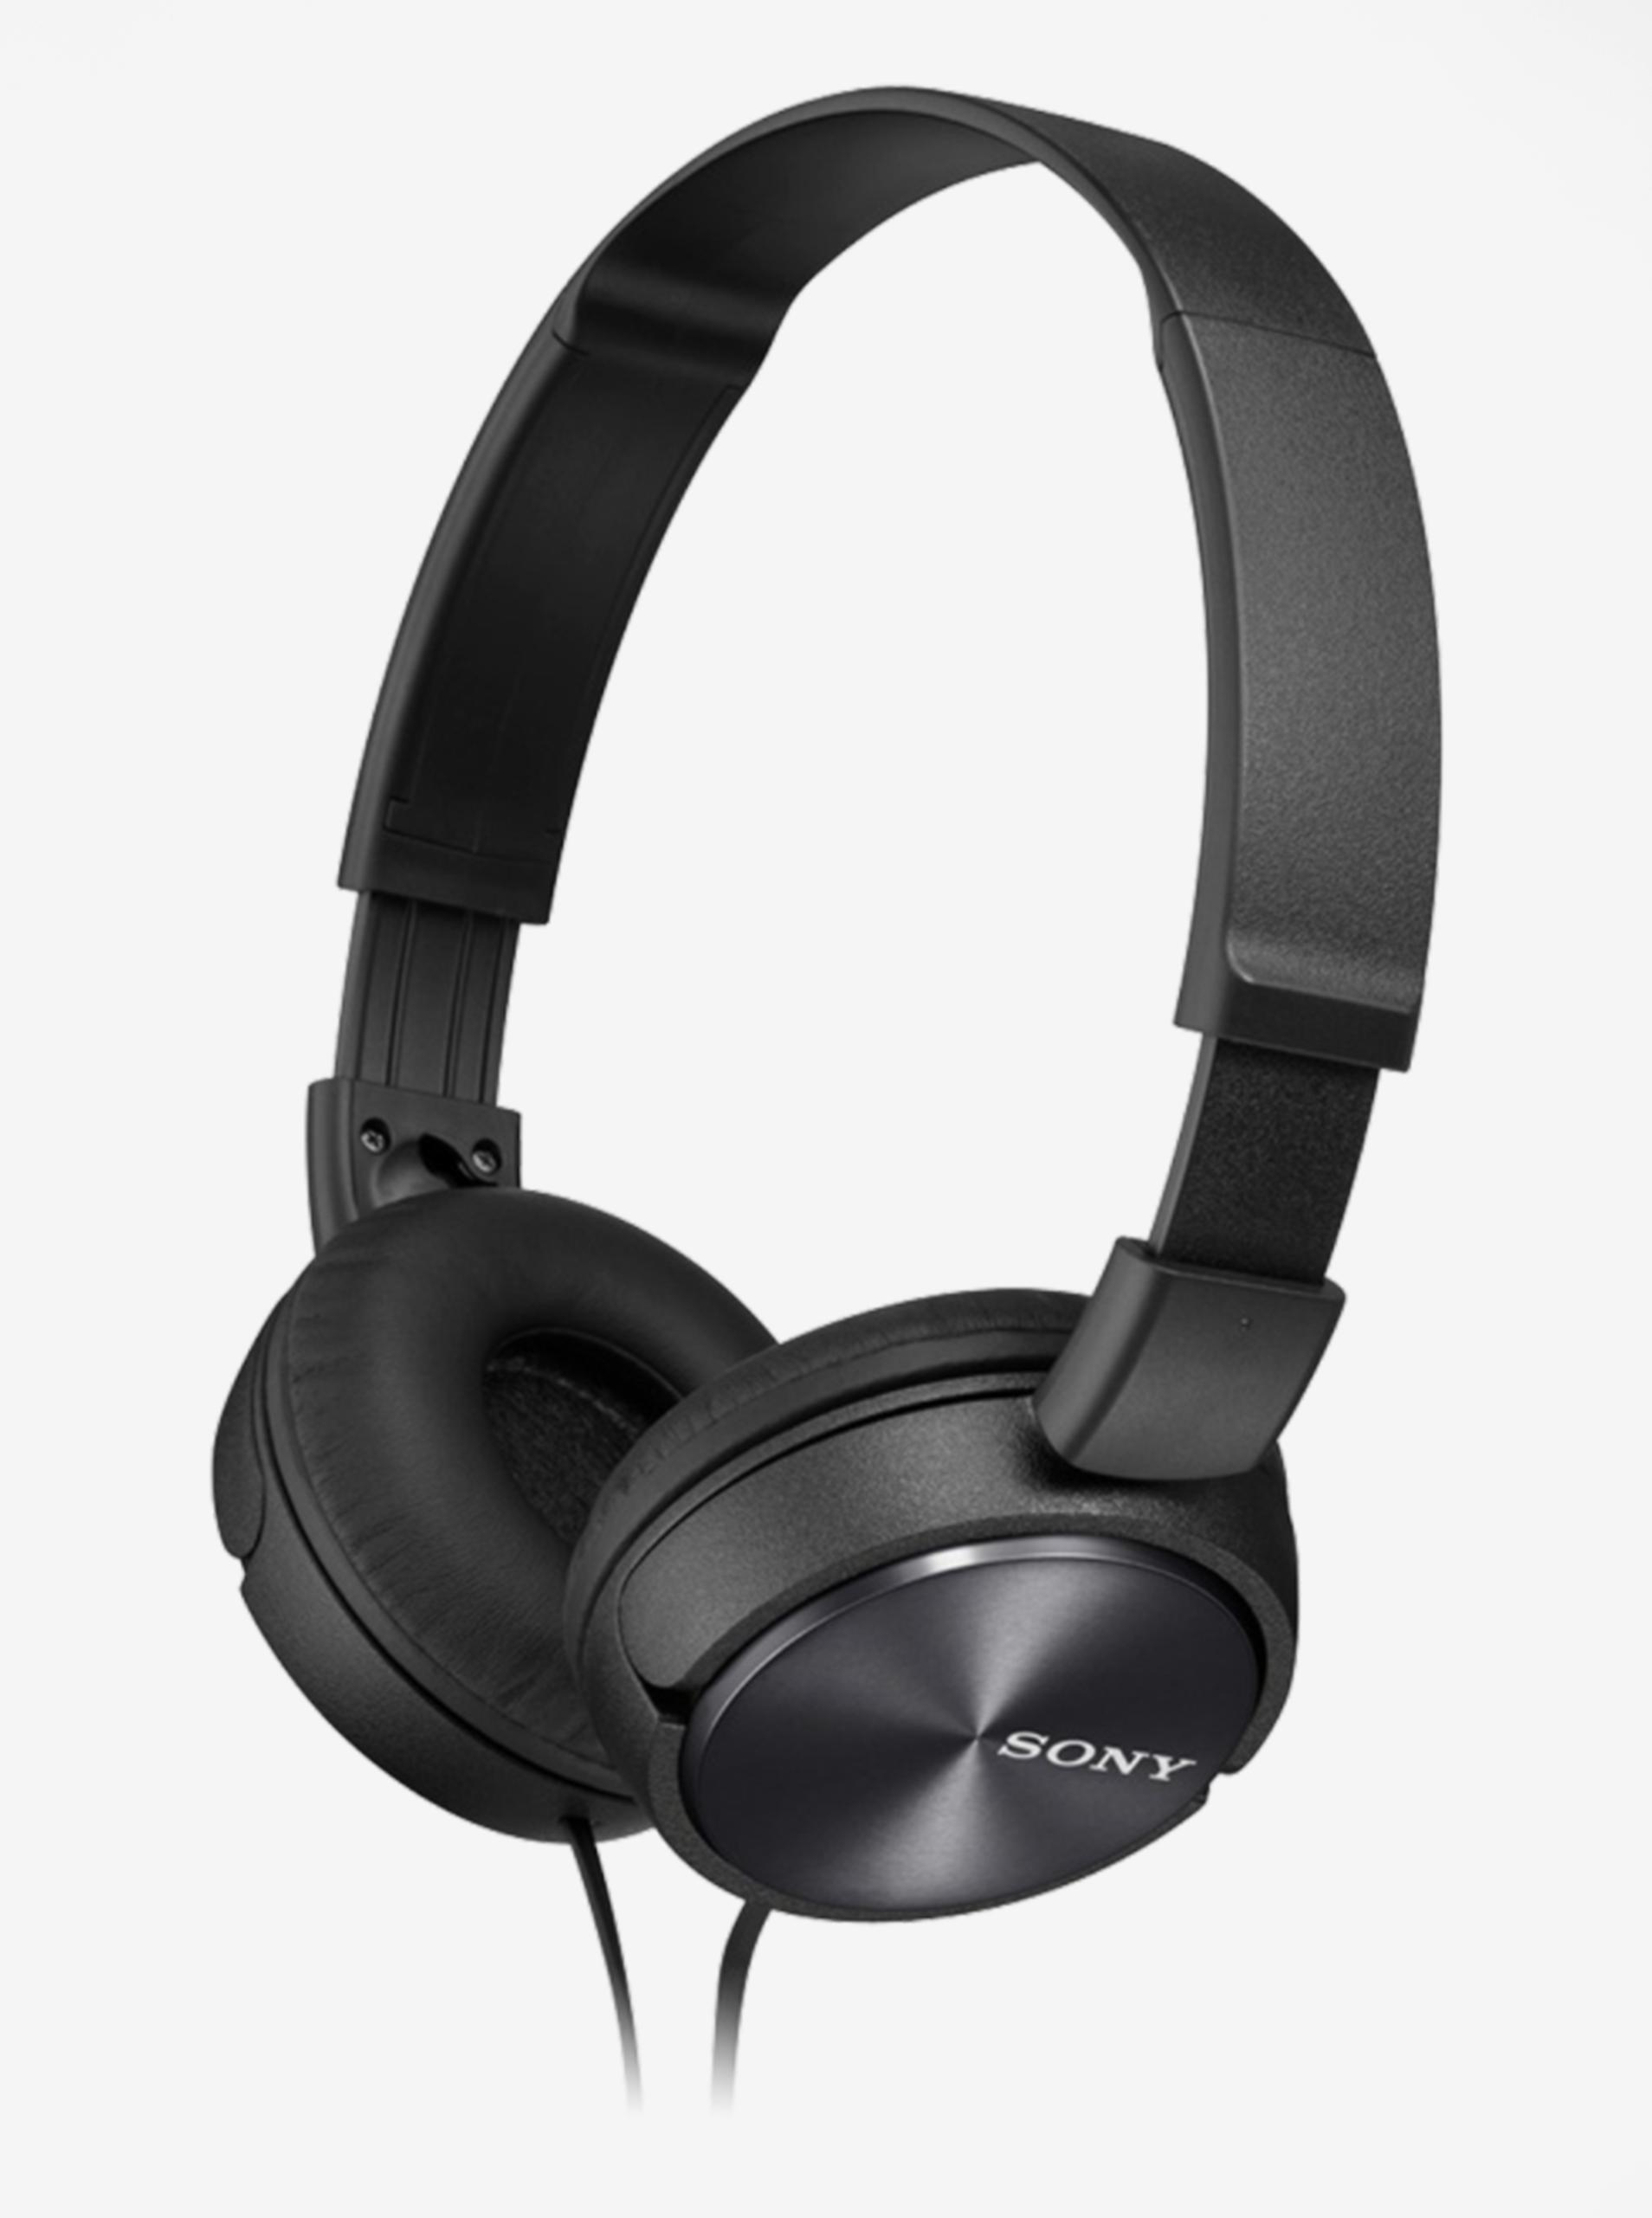 Černá skládací sluchátka Sony